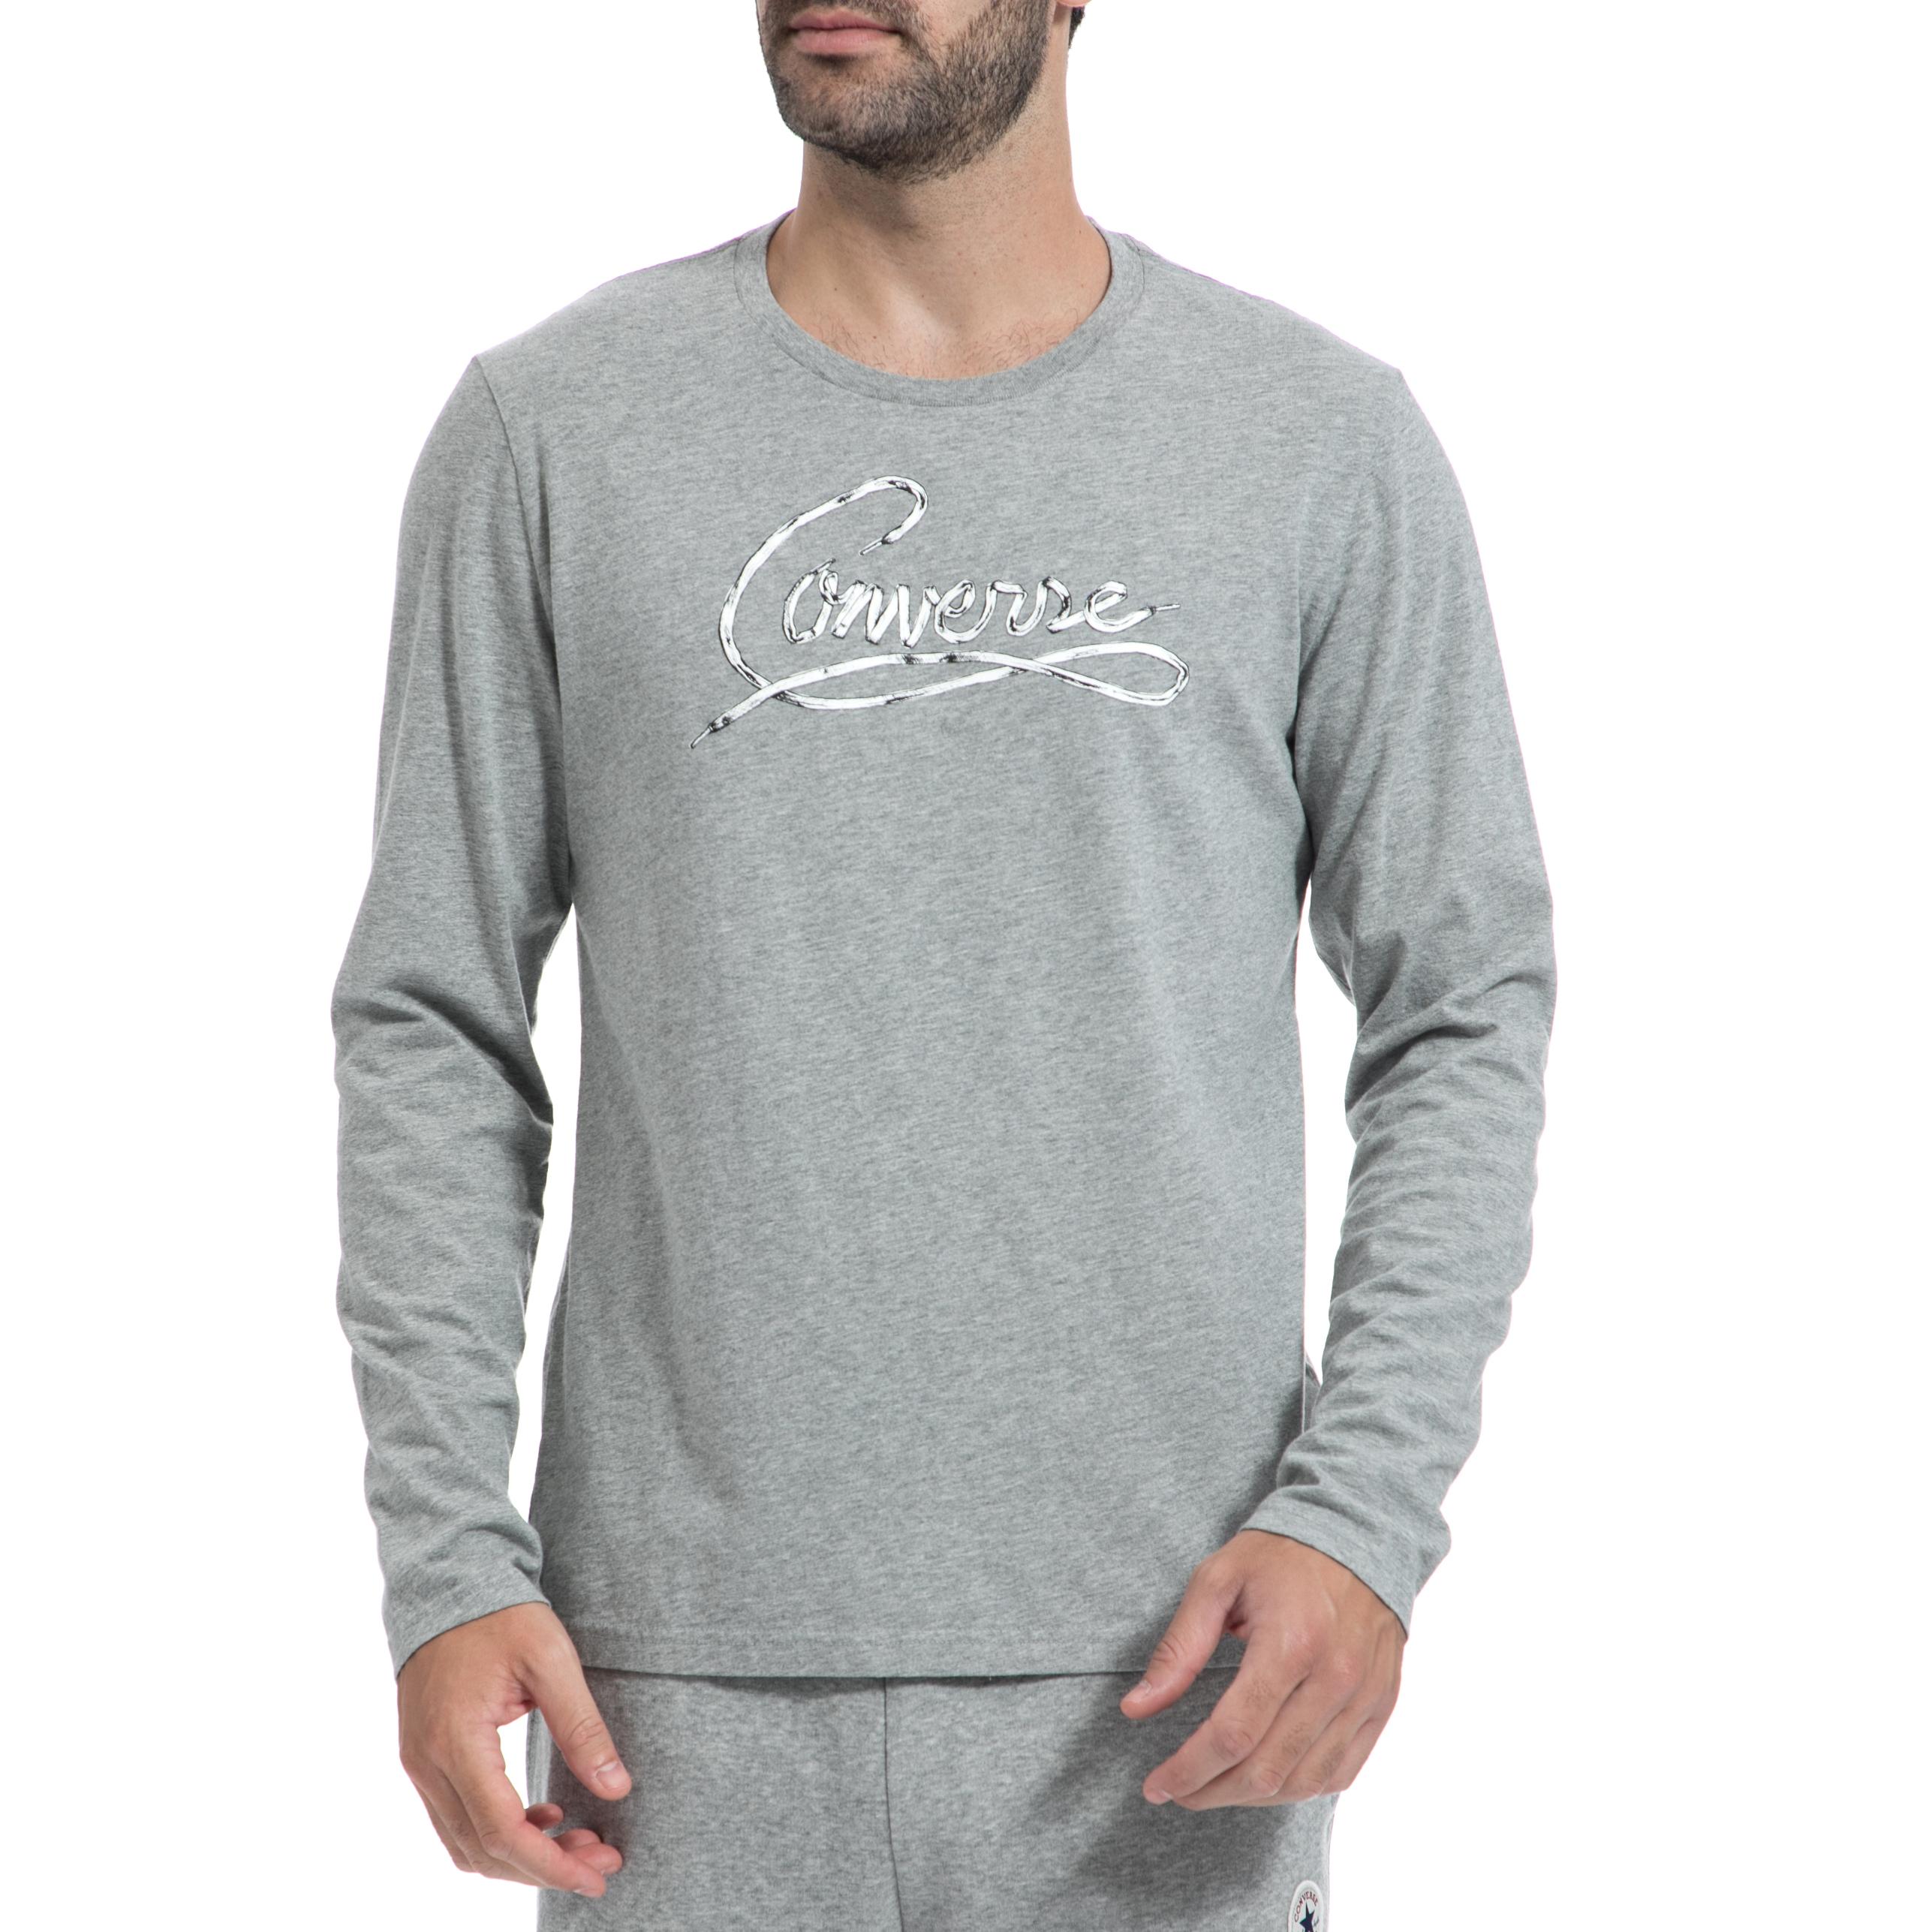 CONVERSE - Ανδρική μπλούζα CONVERSE γκρι ανδρικά ρούχα αθλητικά φούτερ μακρυμάνικα